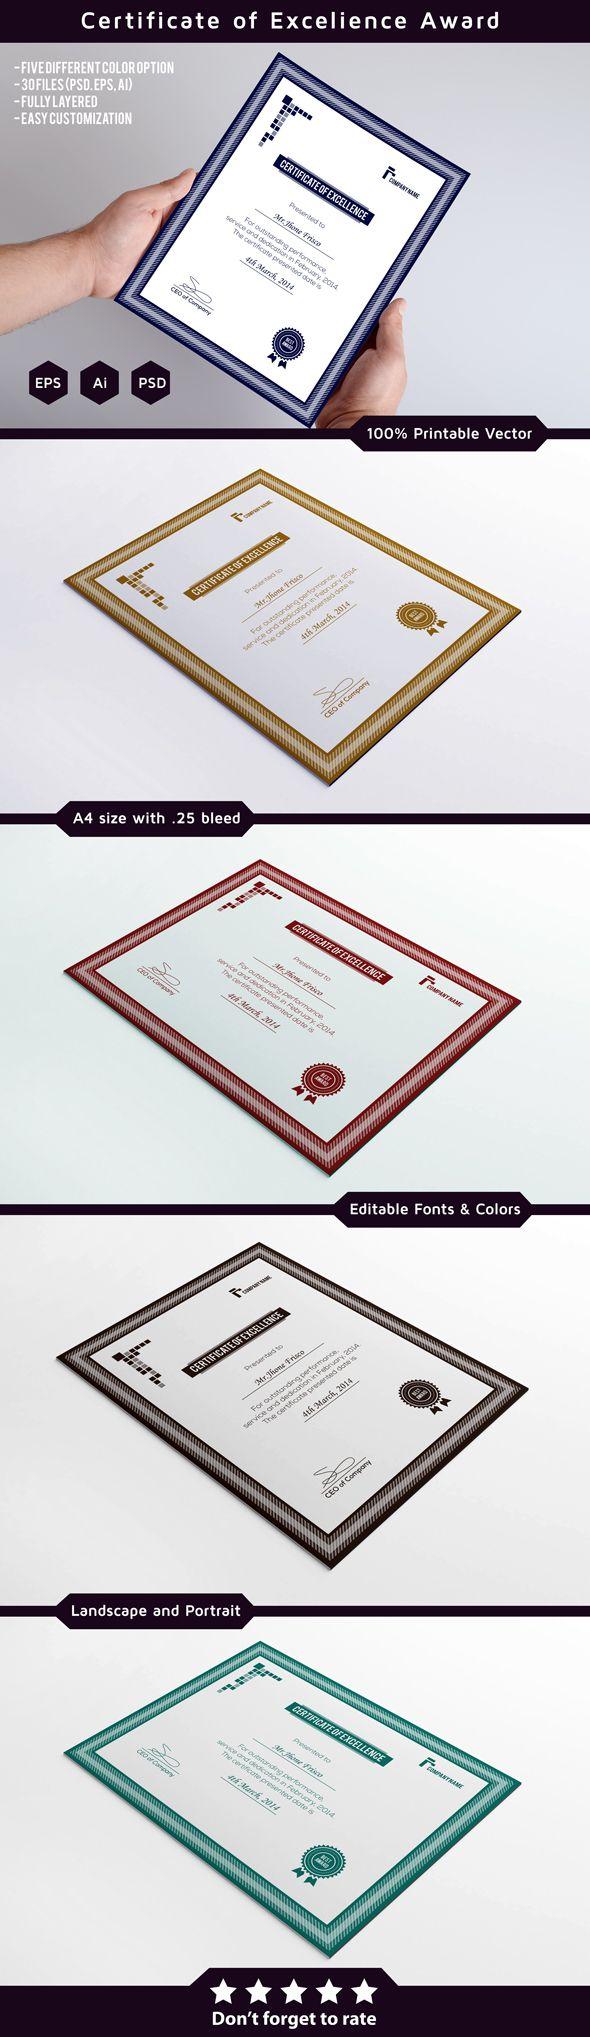 Best 25+ Certificate design ideas on Pinterest